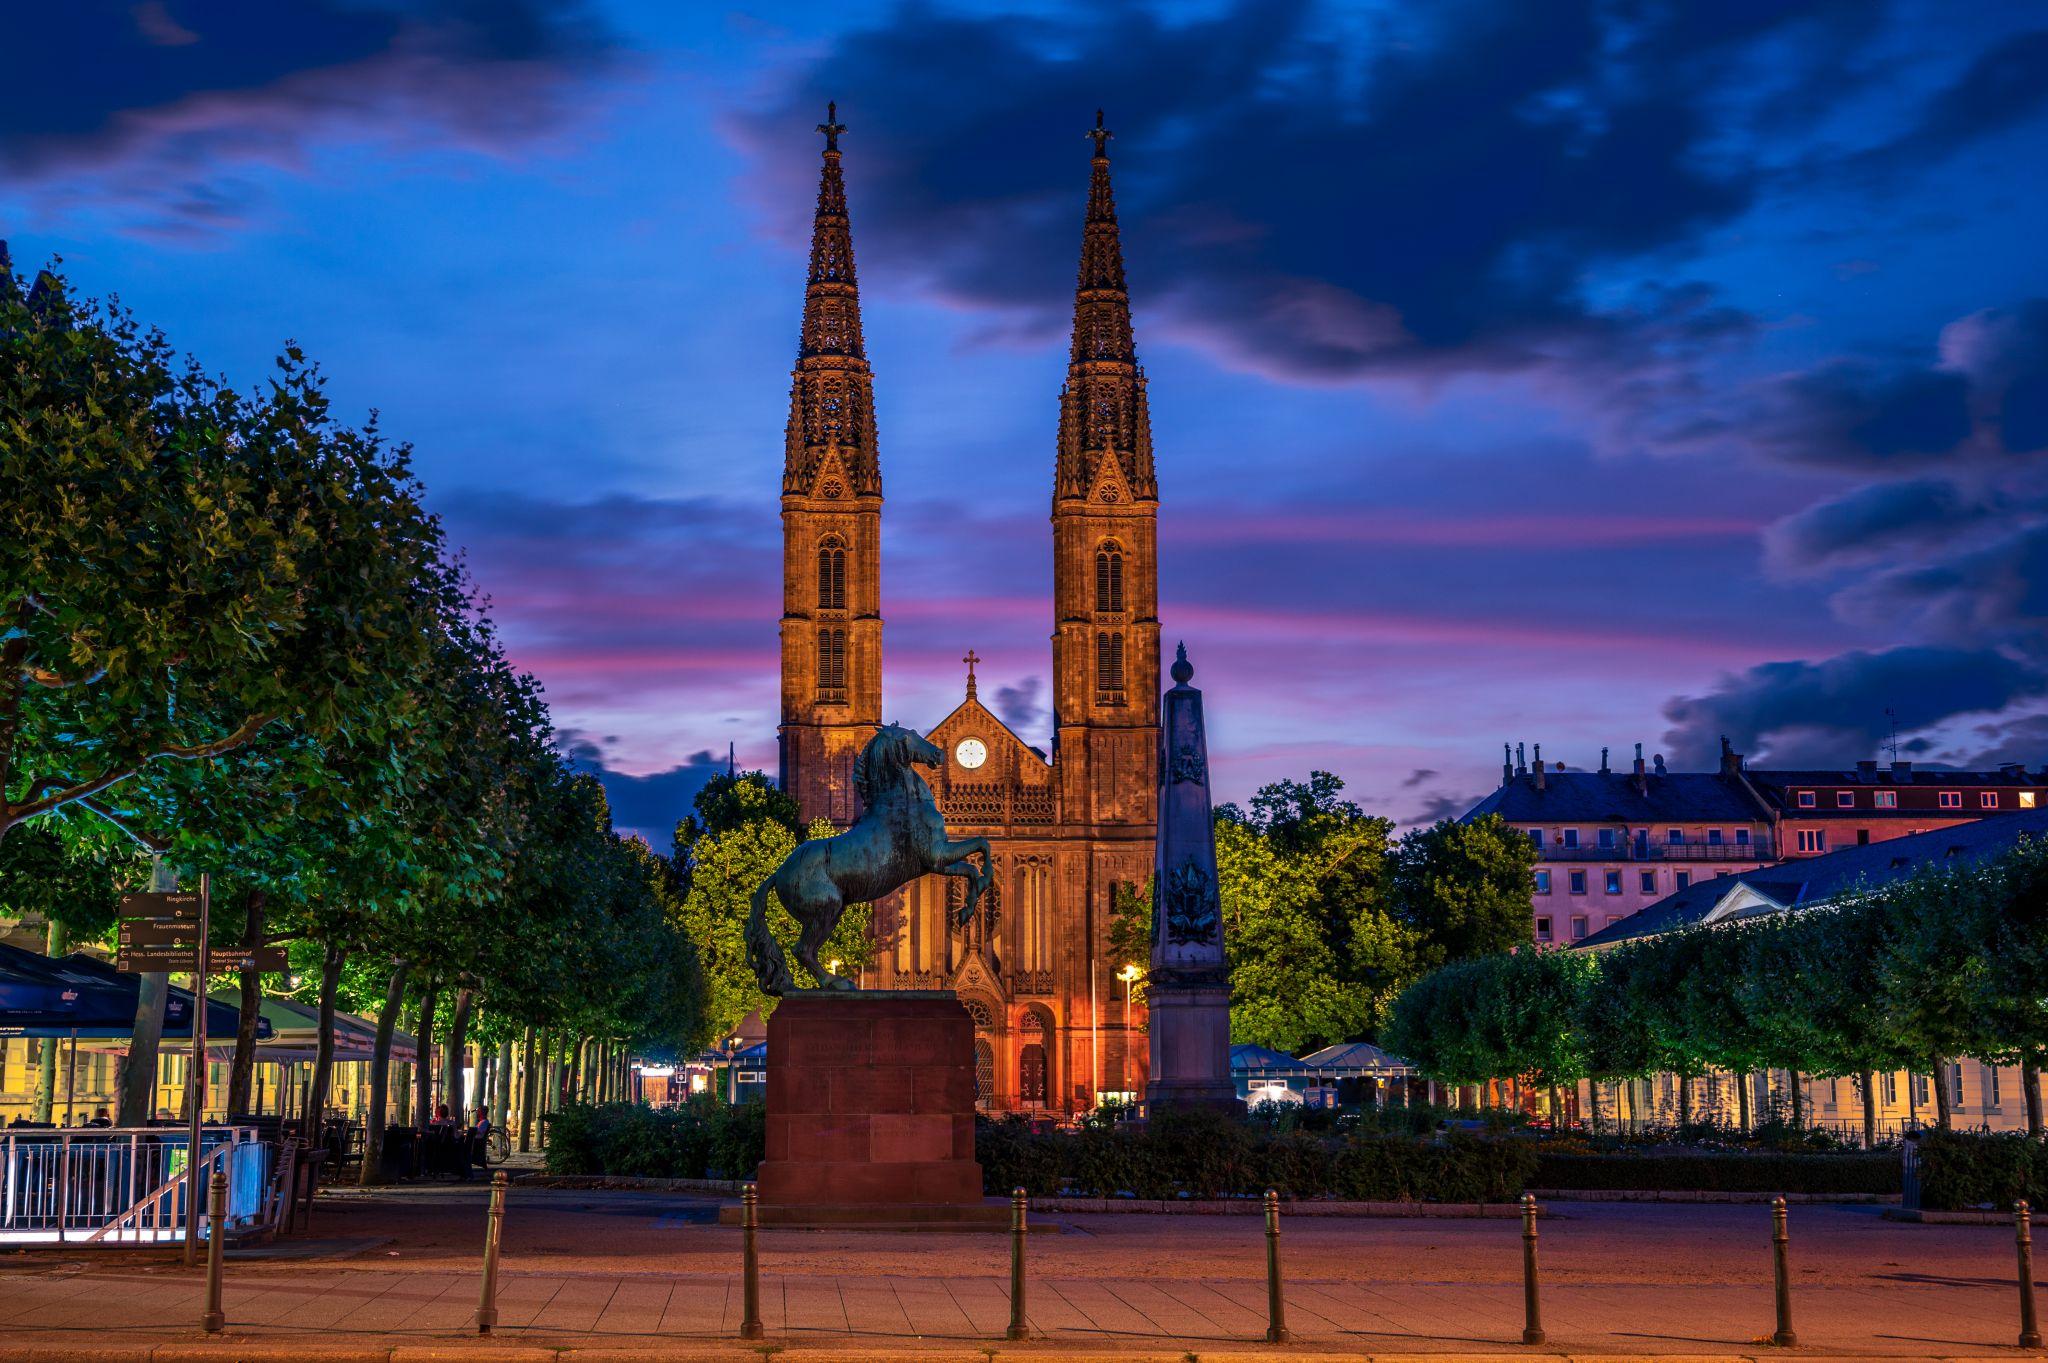 Luisenplatz, Wiesbaden, Germany